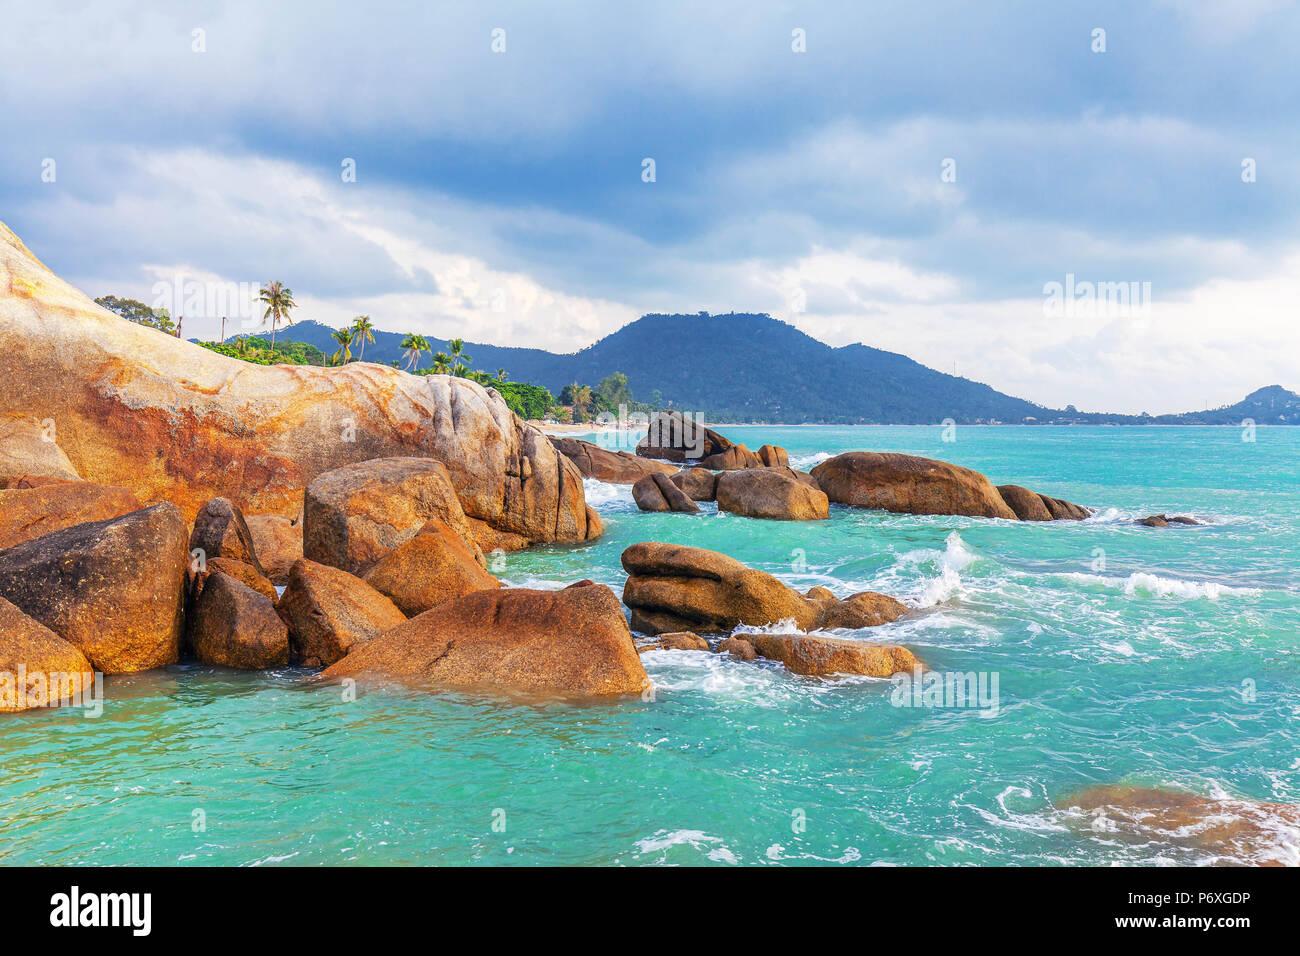 Hin Ta und Hin Yai Felsen. Ein berühmter Ort auf der Insel Koh Samui in Thailand. Stockbild